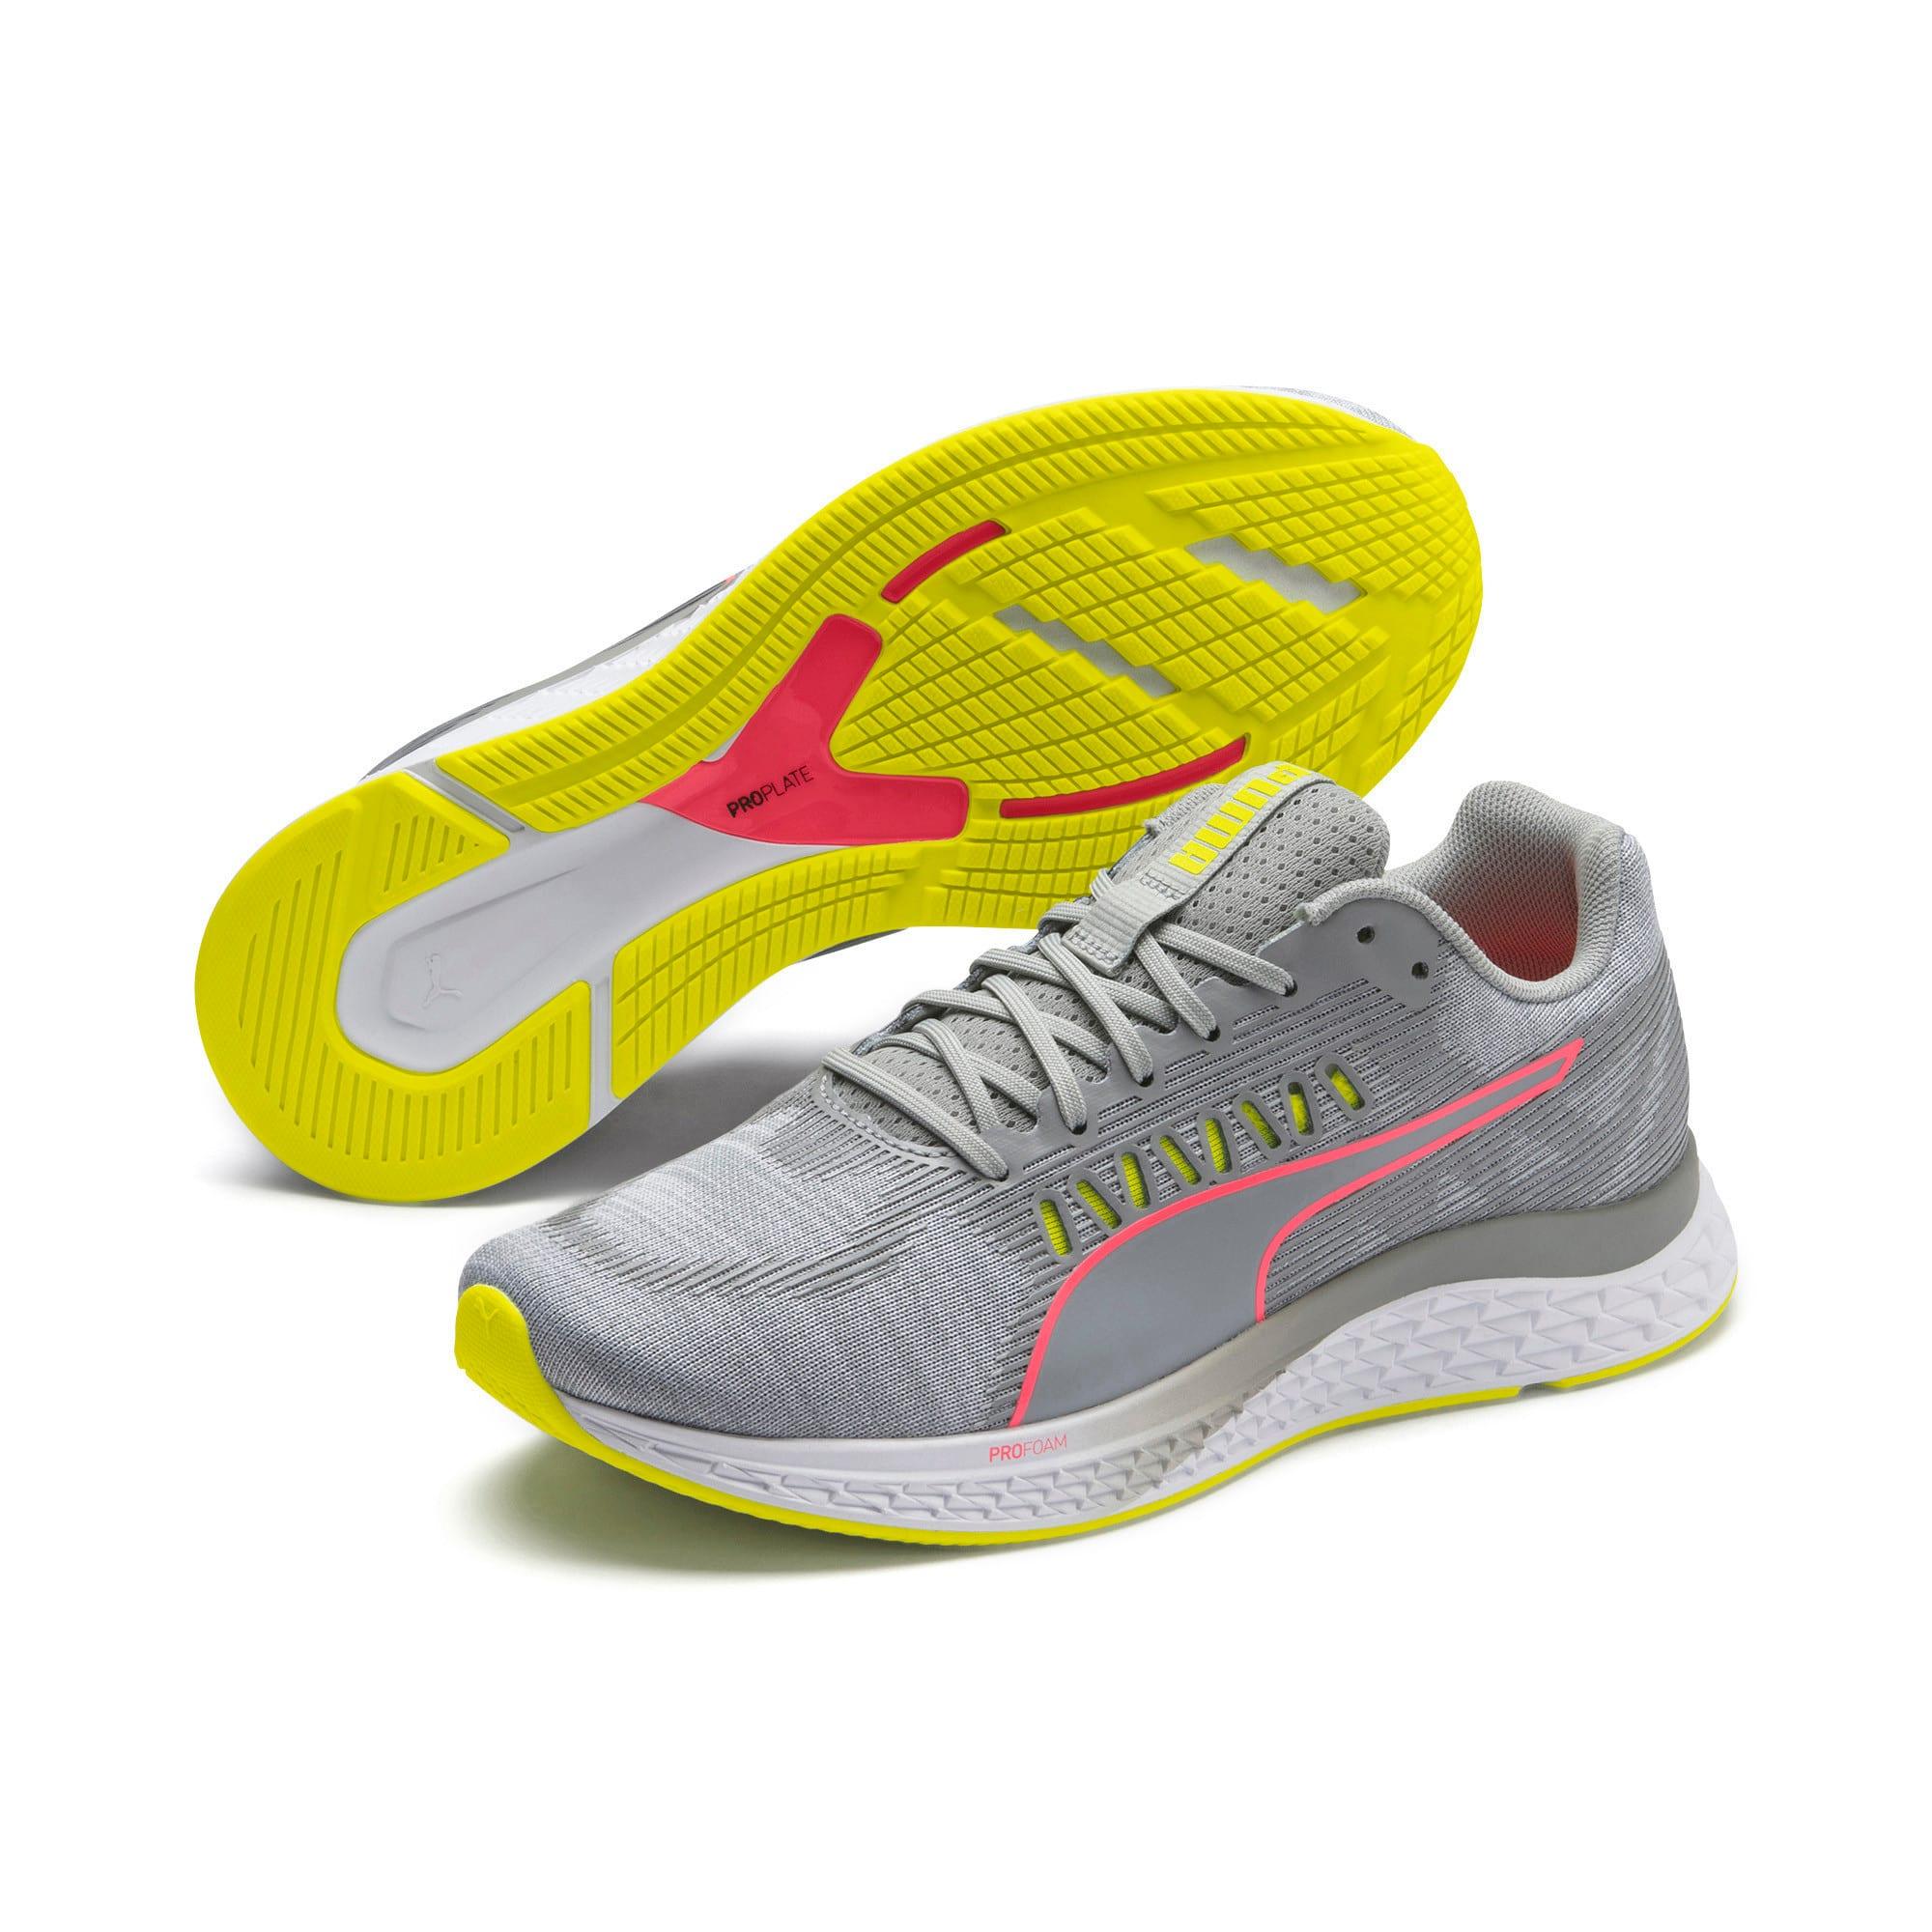 Thumbnail 9 of Speed Sutamina Women's Running Shoes, Quarry-Yellow Alert-Pink, medium-IND